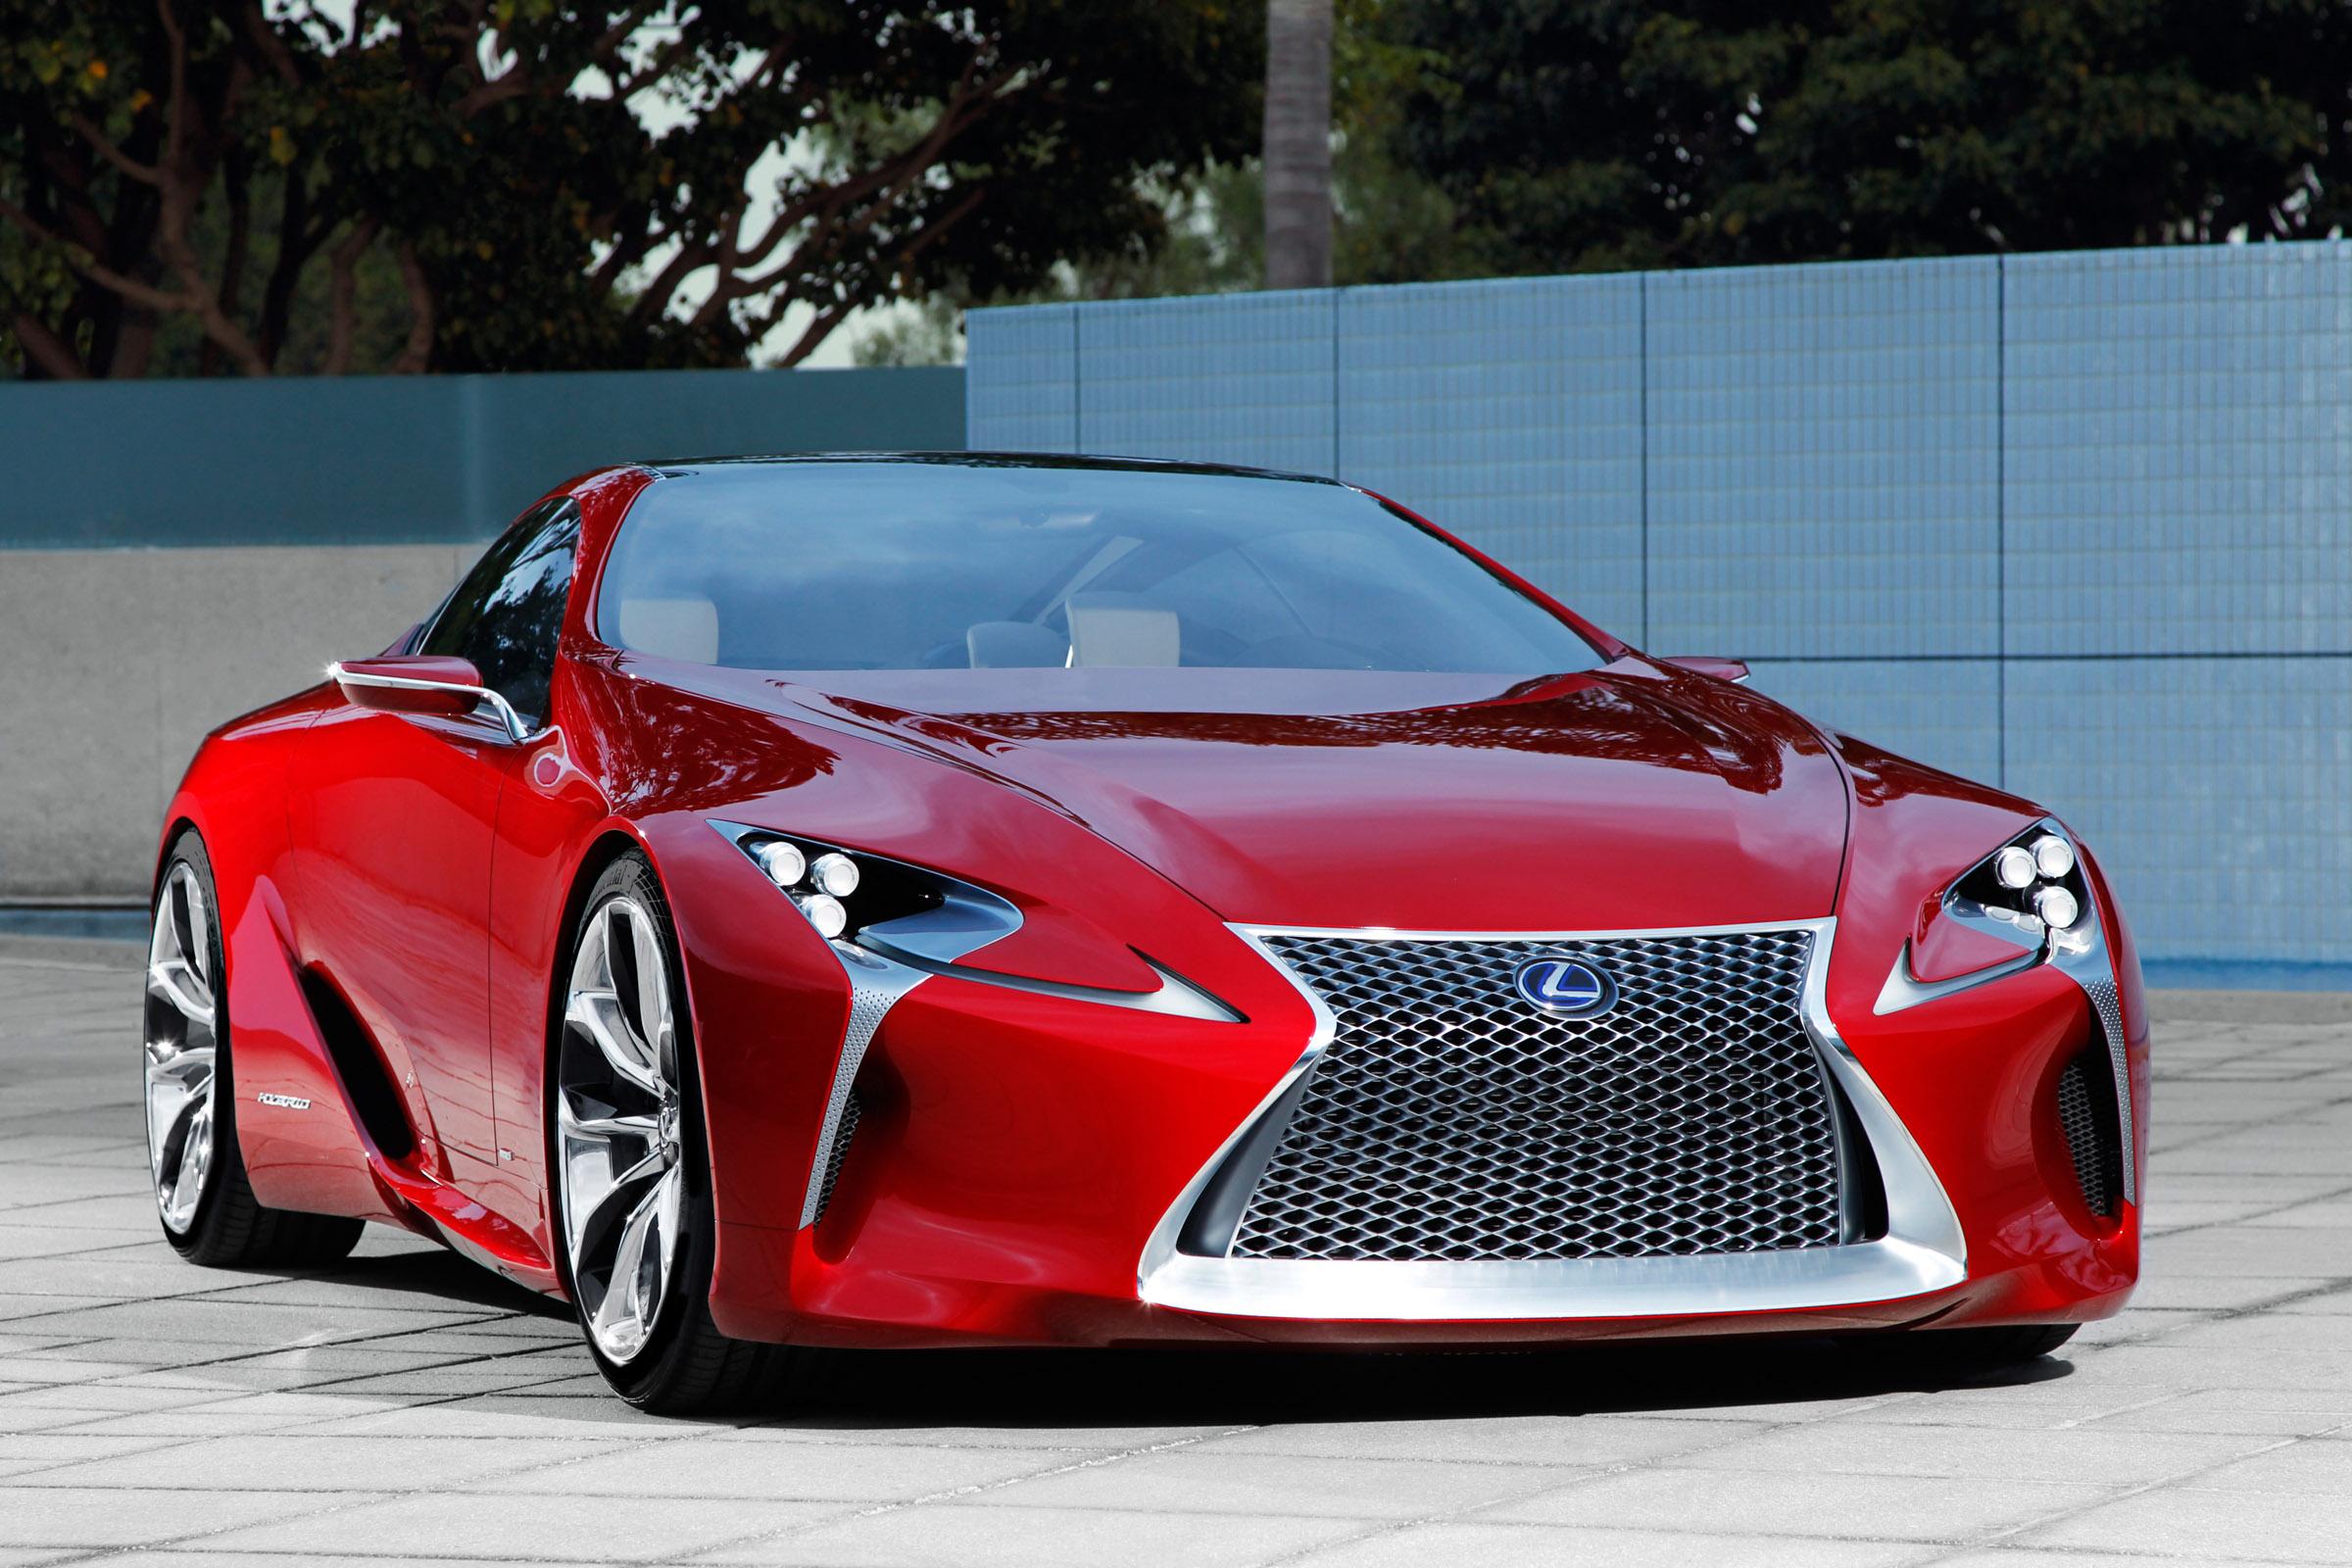 https://www.automobilesreview.com/gallery/2012-lexus-lf-lc-sport-coupe-concept/2012-lexus-lf-lc-sport-coupe-concept-14.jpg